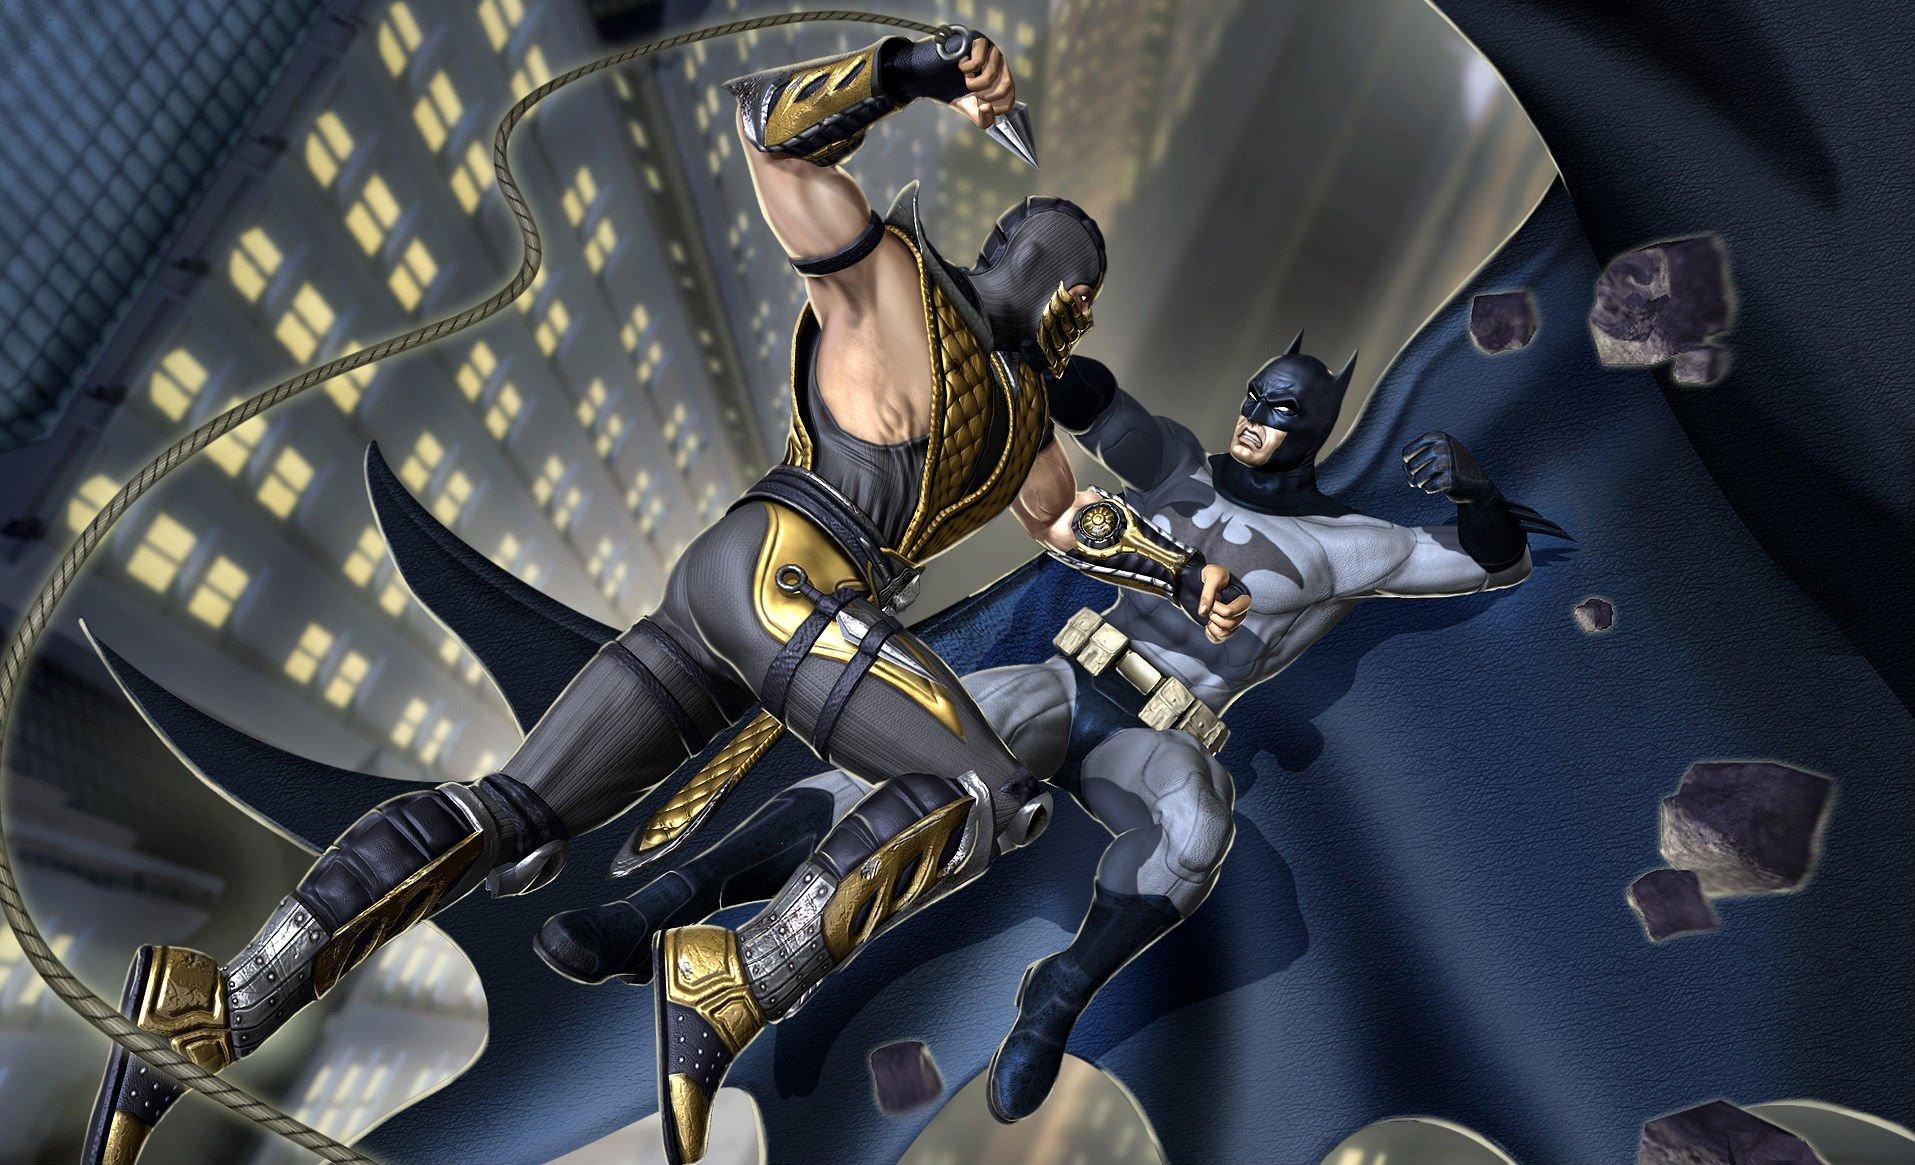 Mortal Kombat Vs. DC Universe Wallpaper and Background Image | 1915x1165 | ID:91095 - Wallpaper Abyss